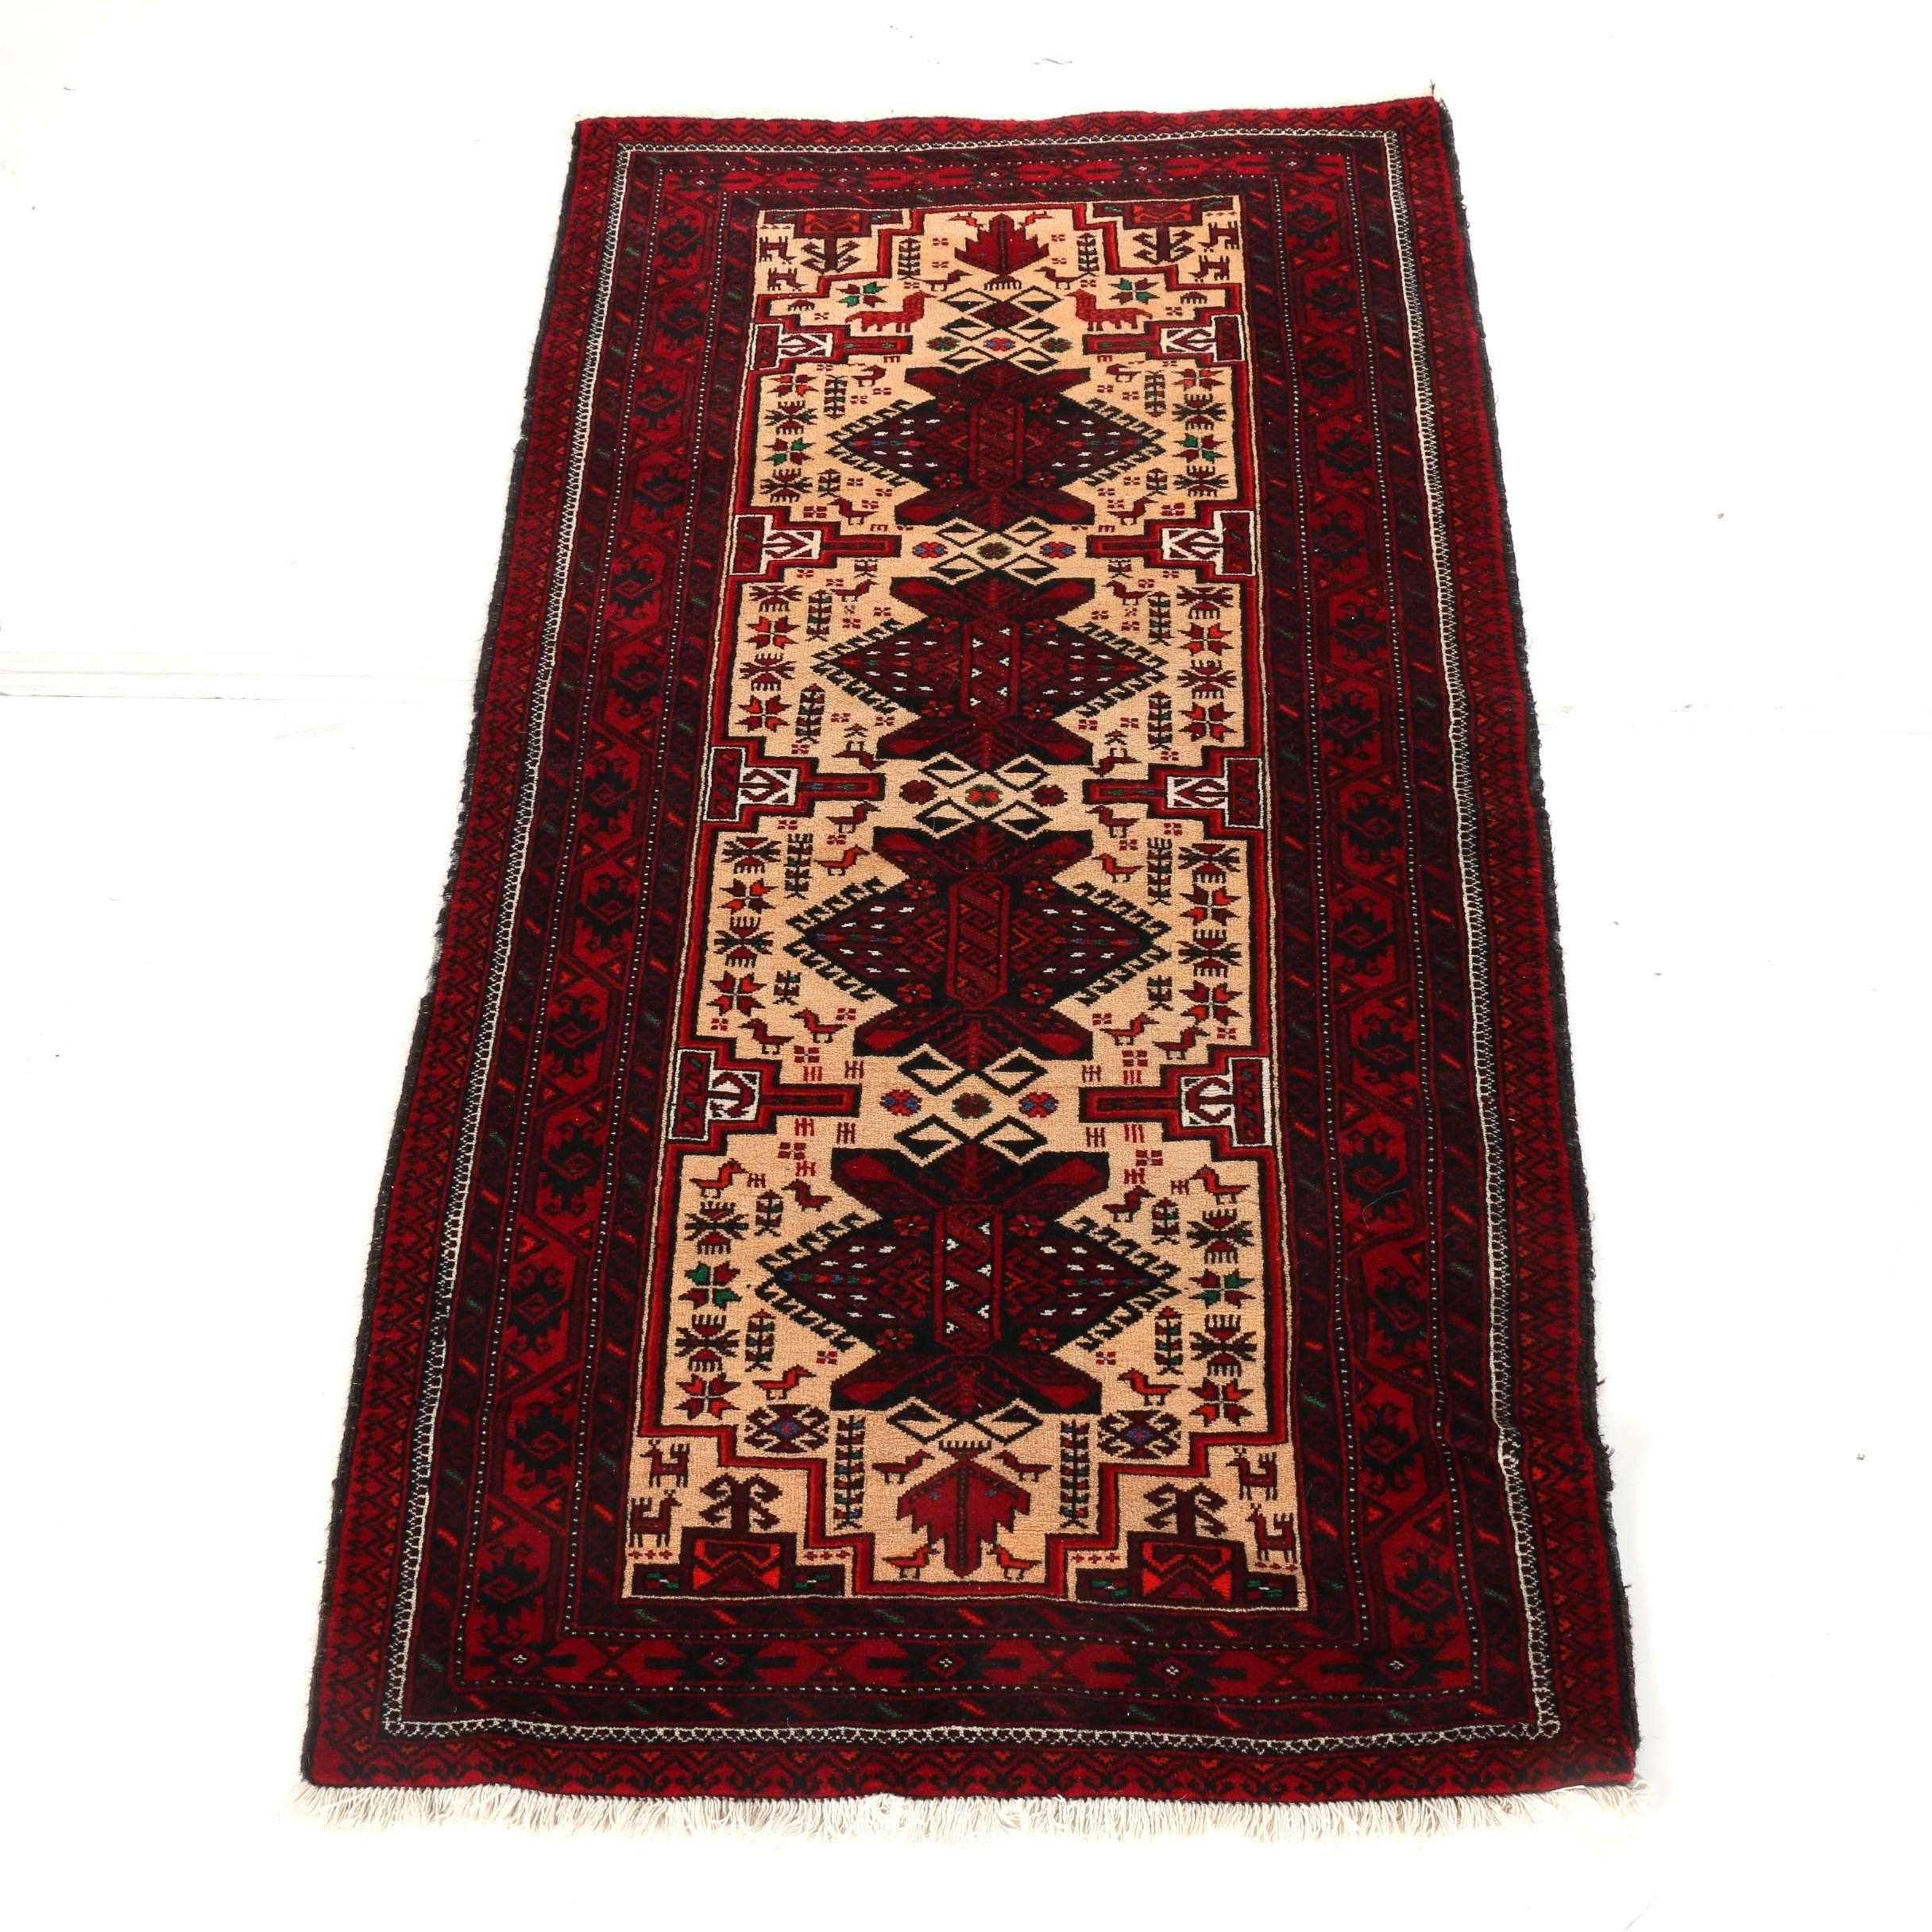 Hand-Knotted Northwest Persia Karaja Carpet Runner